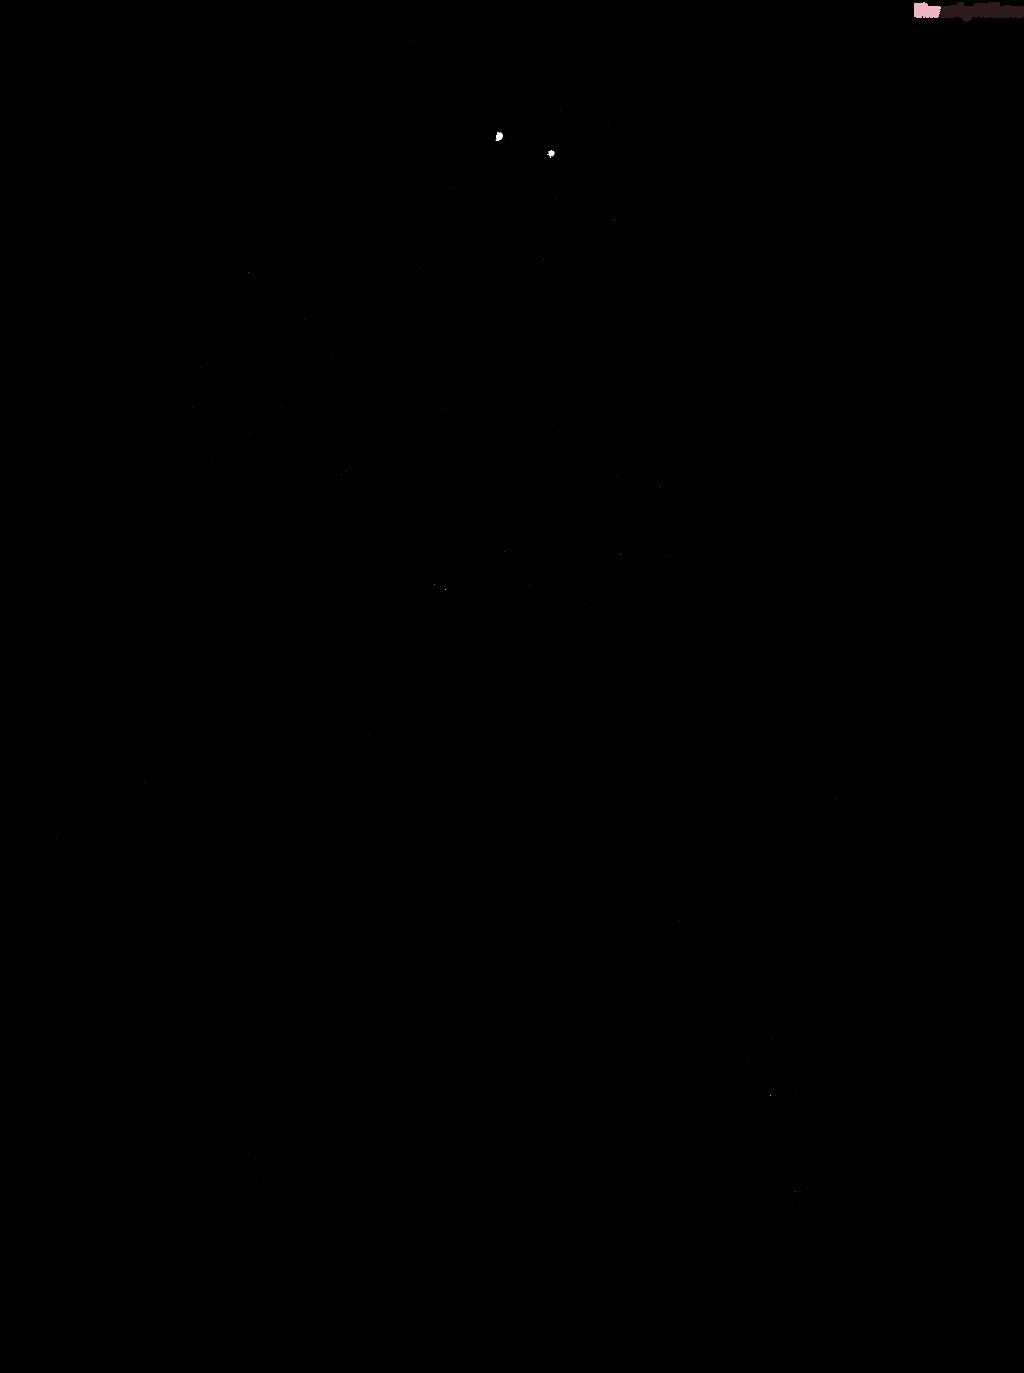 commission 02 megurine luka by millatea on deviantart